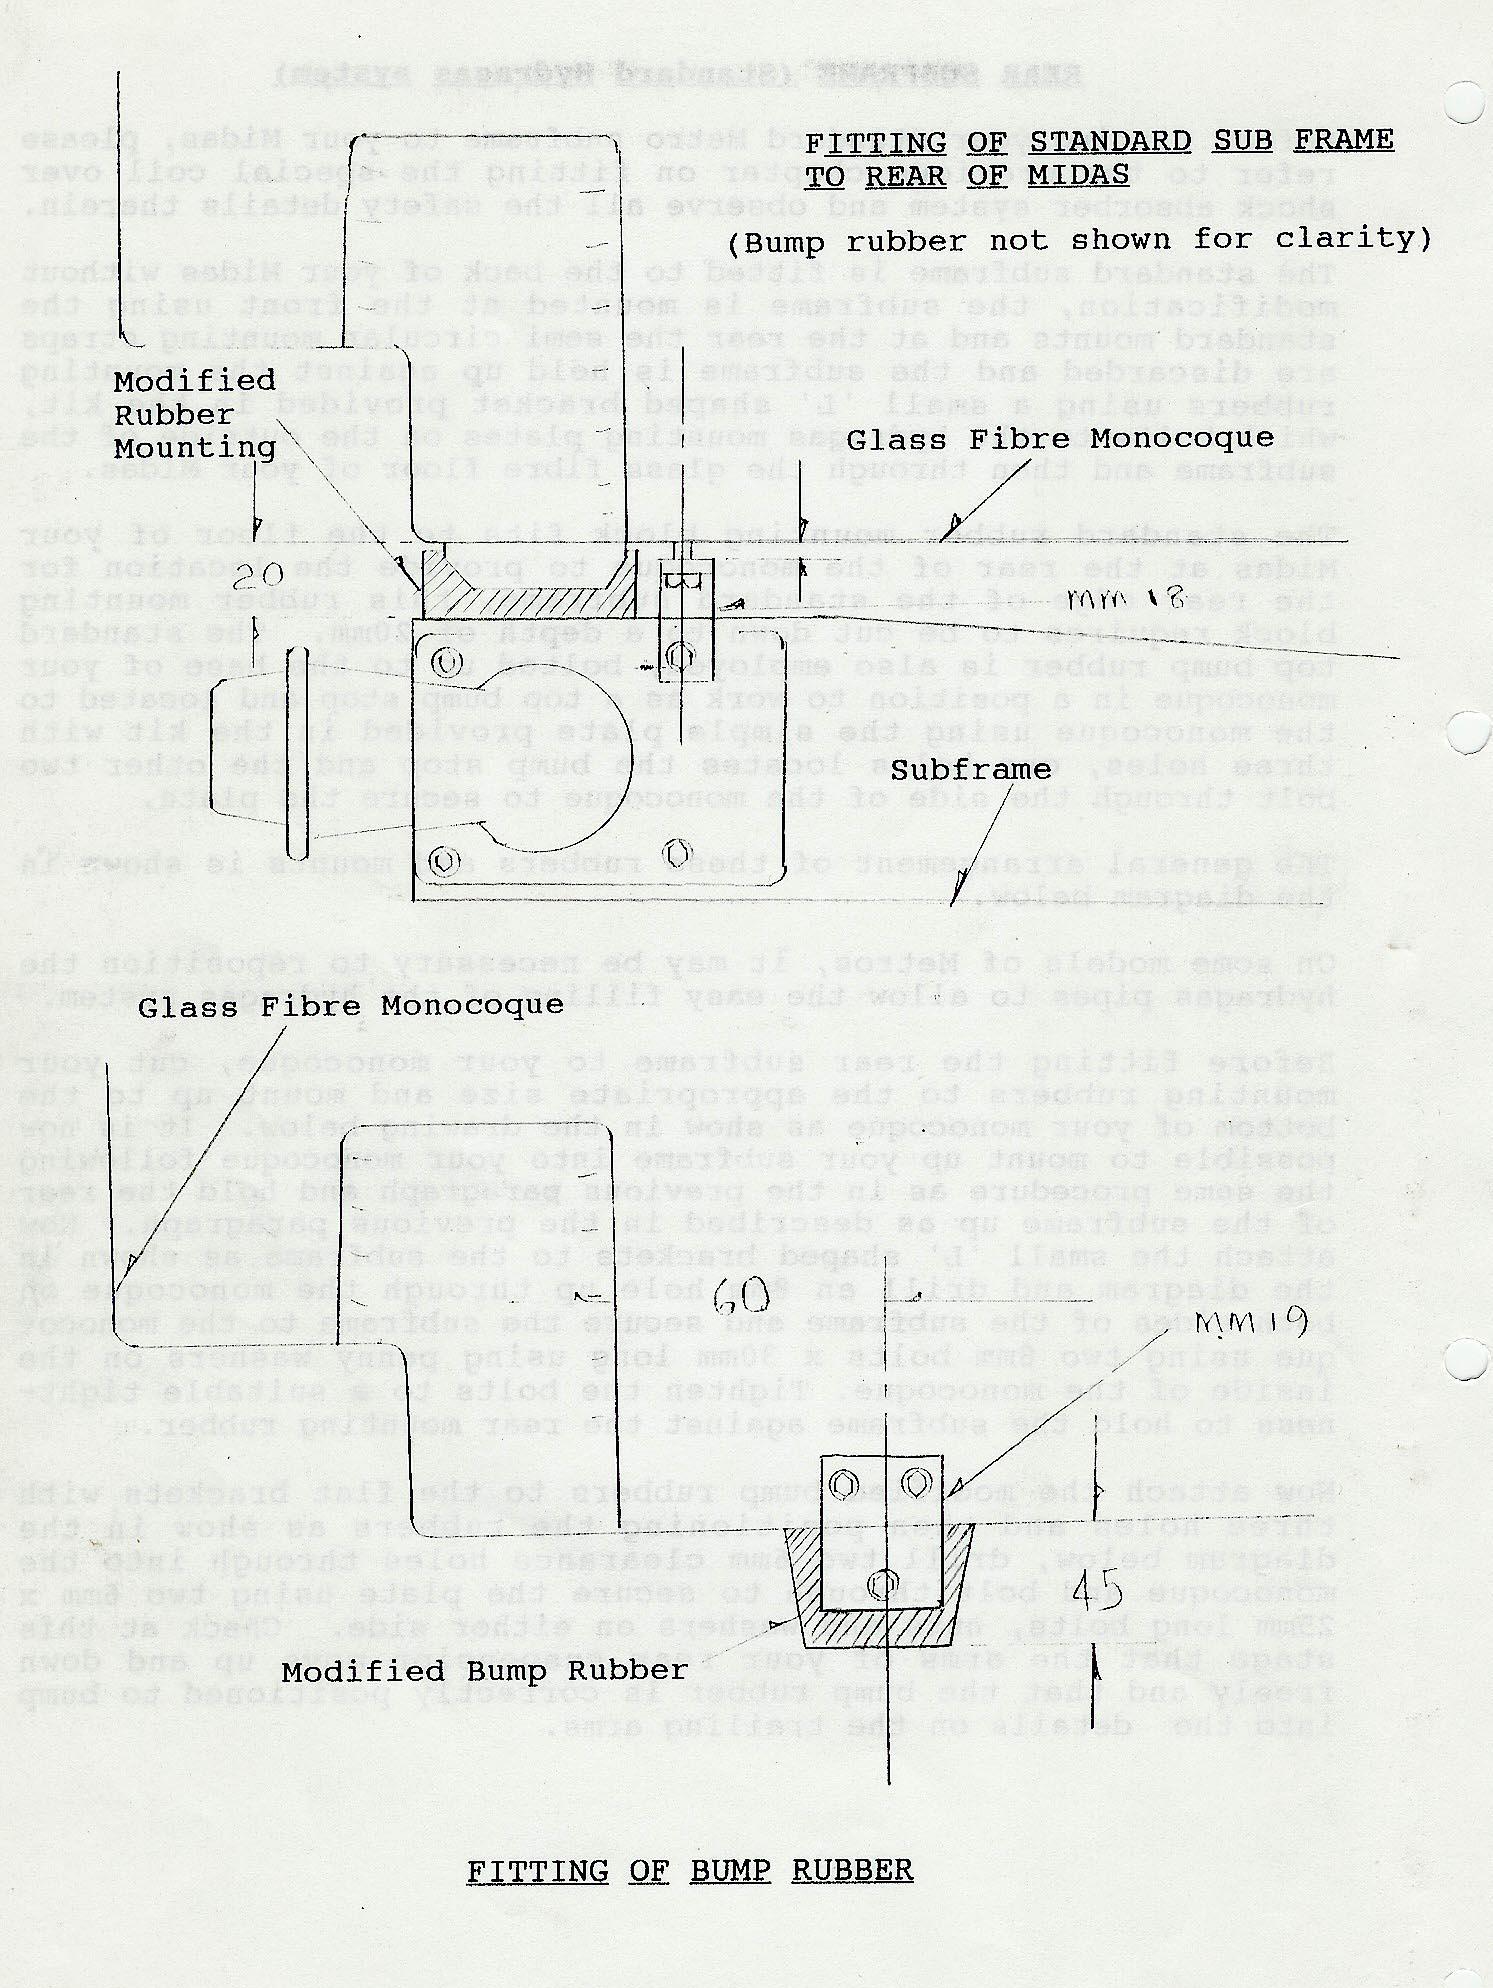 Downloads Midas Owners Club Rover 200 Wiring Diagram Pdf Rear Bump Stop Diag 1 399kb Jan 15 2014 064937 Pm